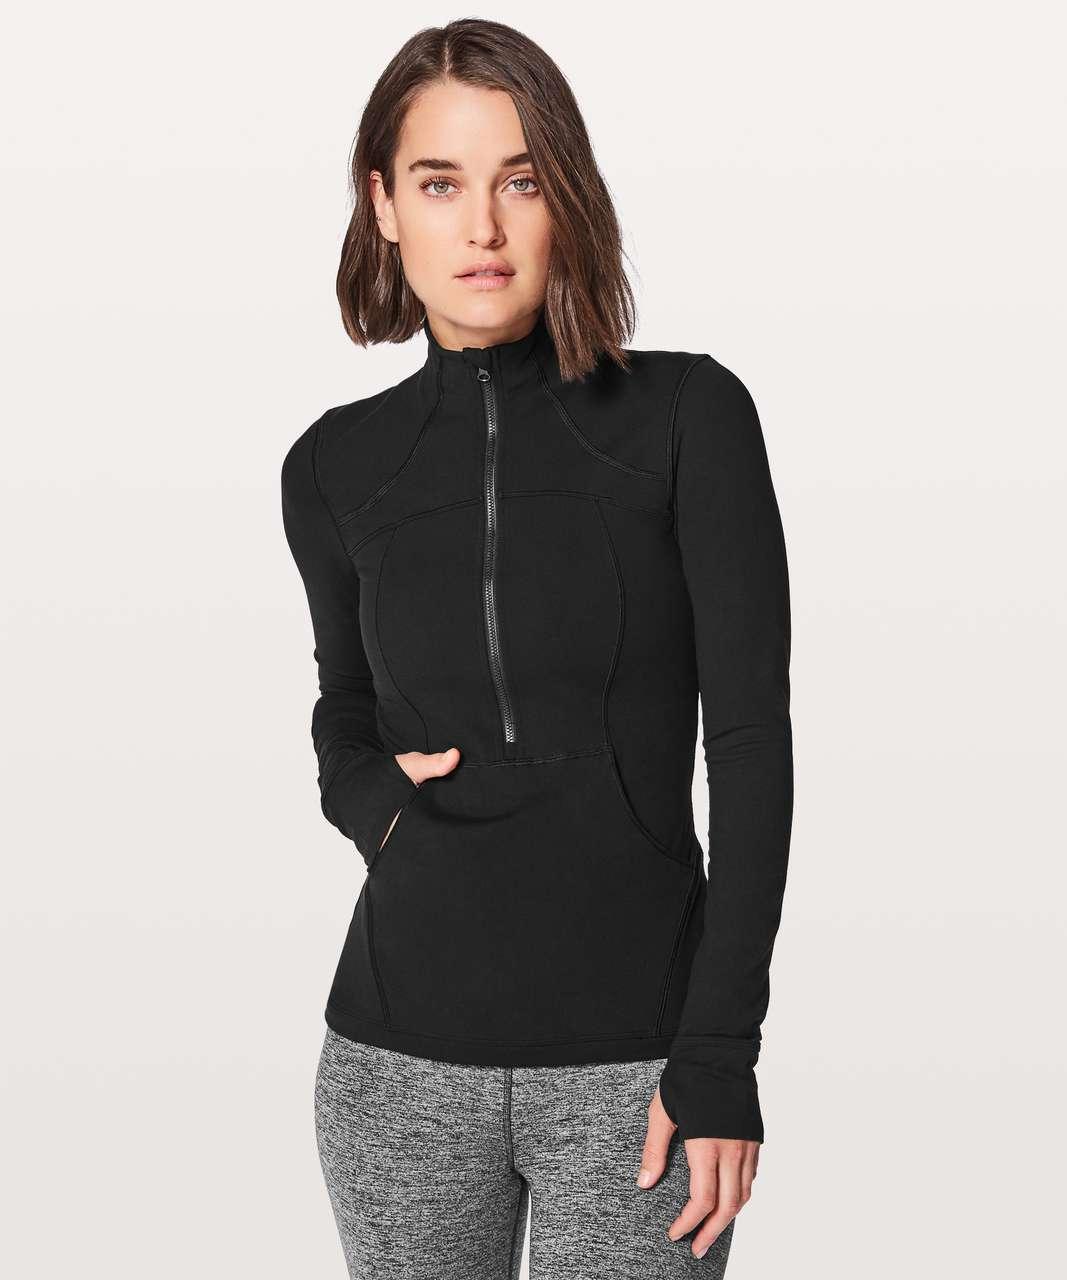 Lululemon Define Pullover - Black